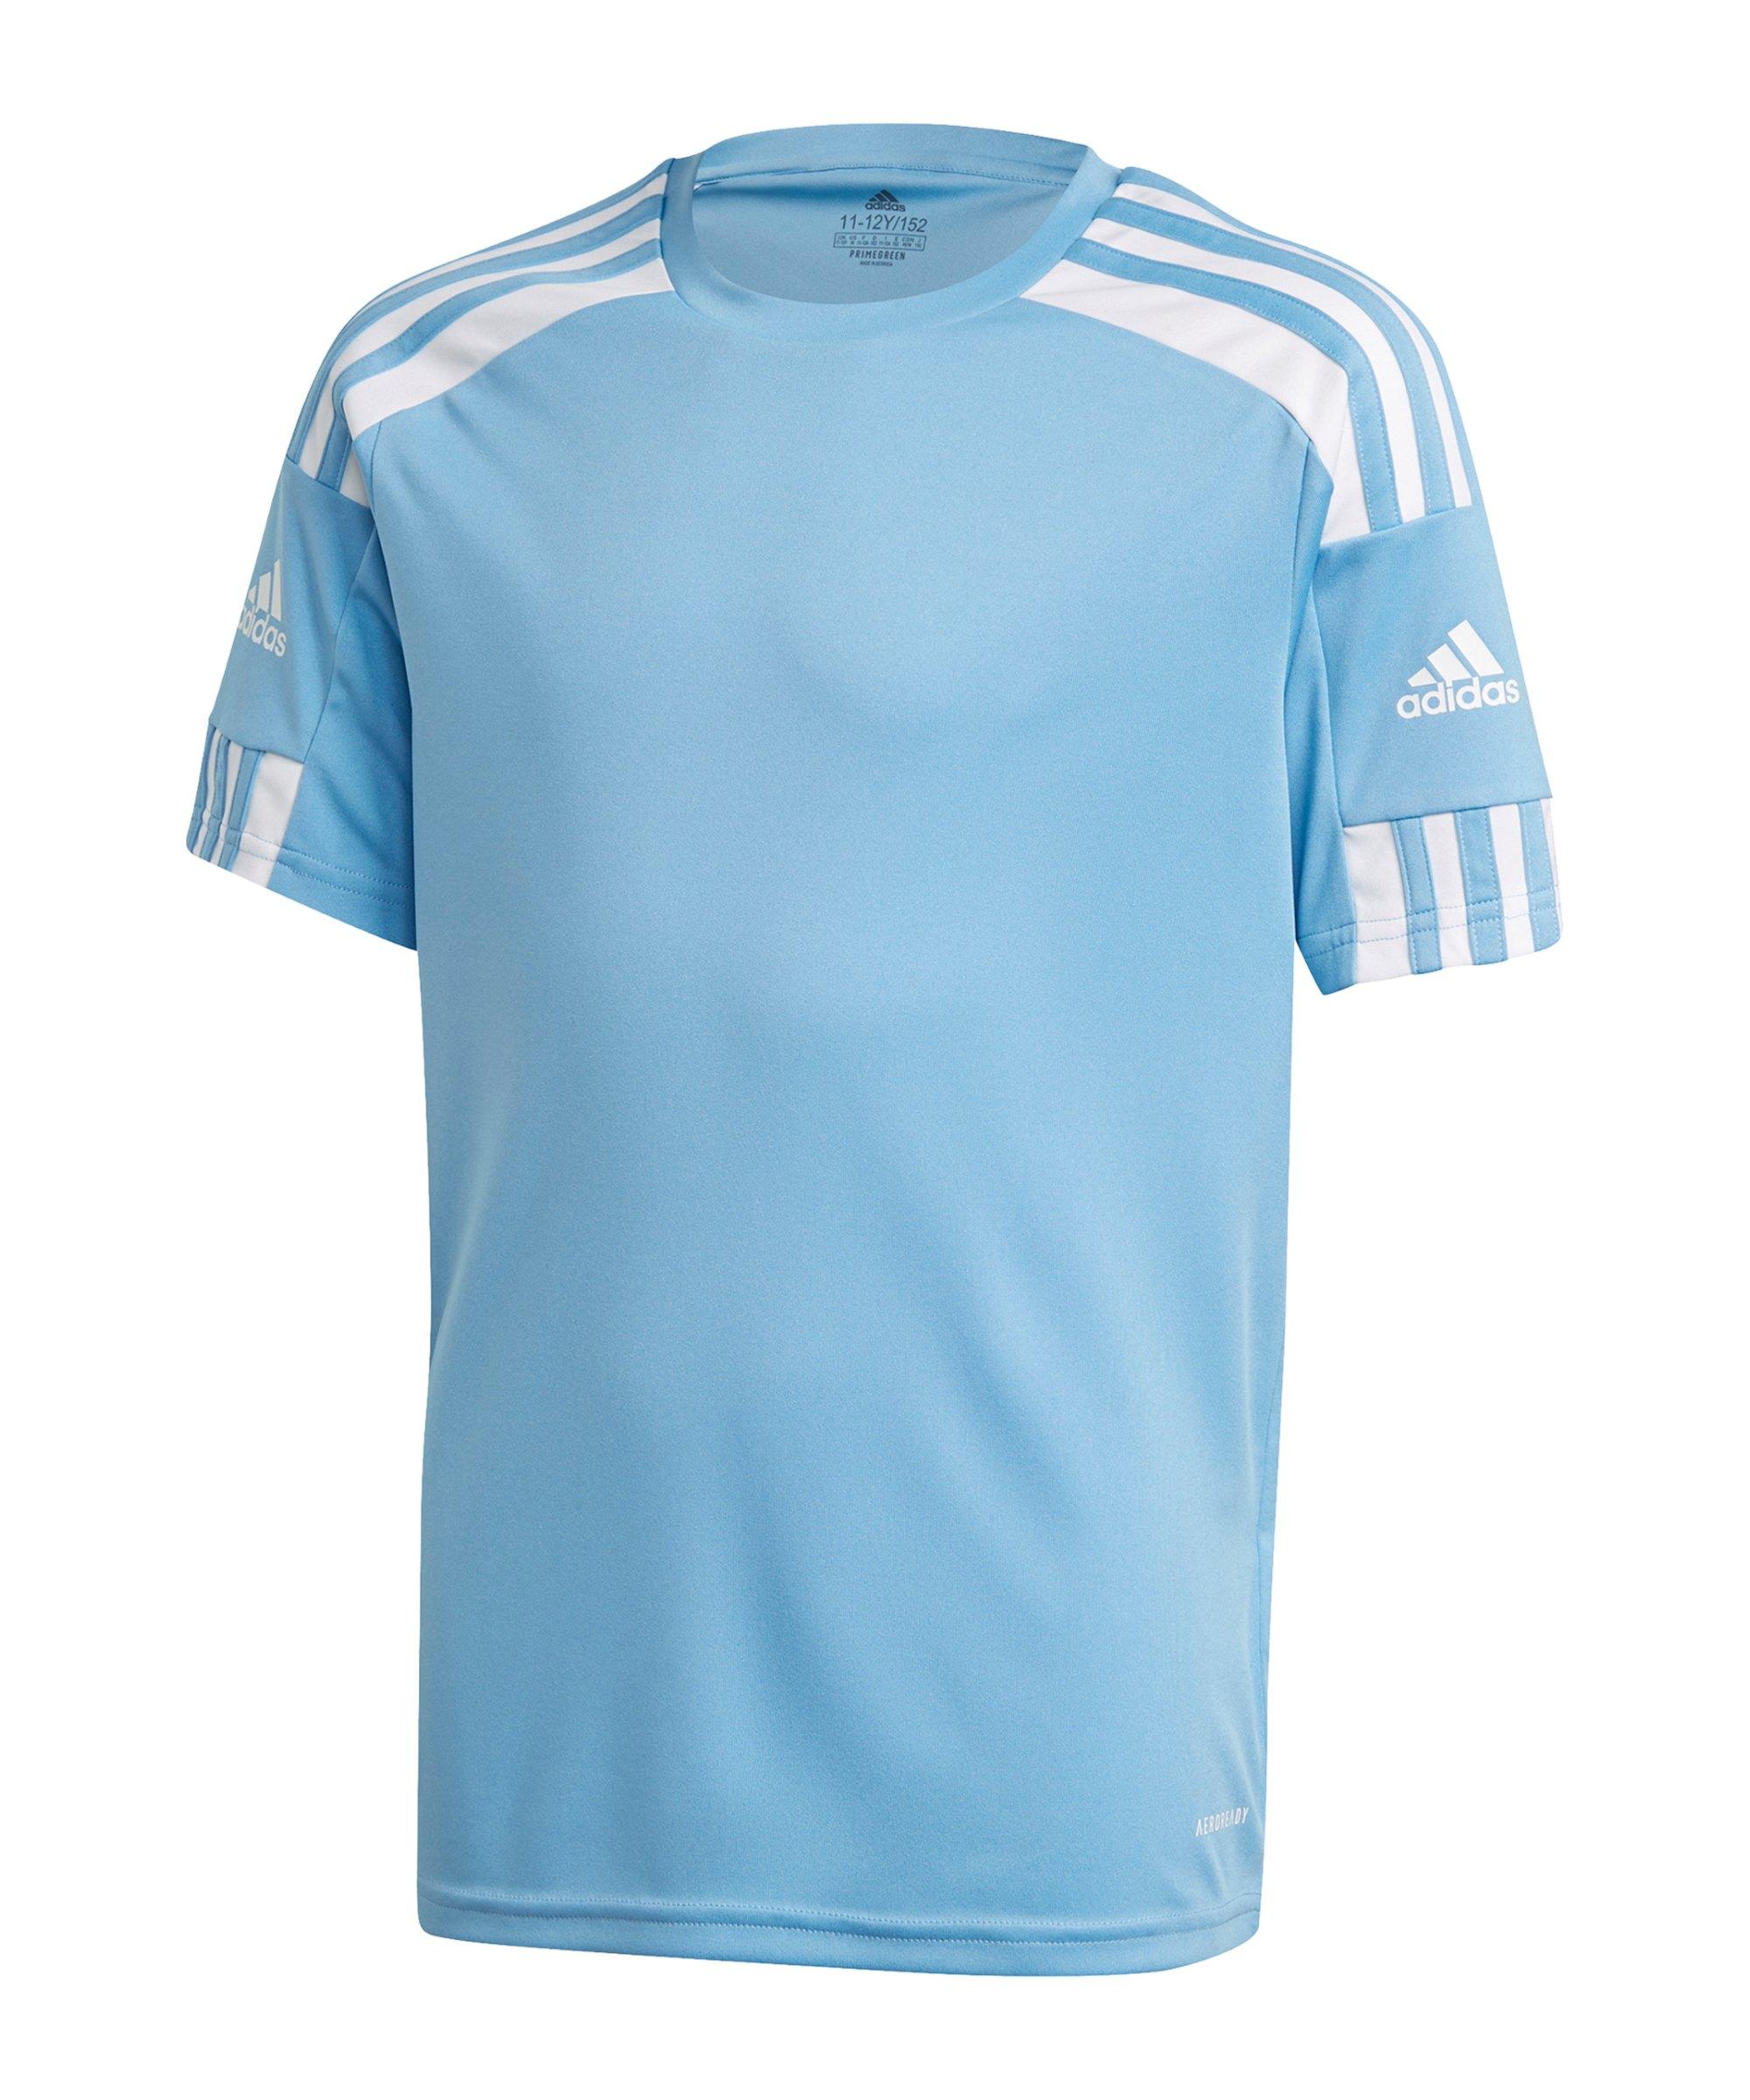 adidas Squadra 21 Trikot Kids Hellblau - blau